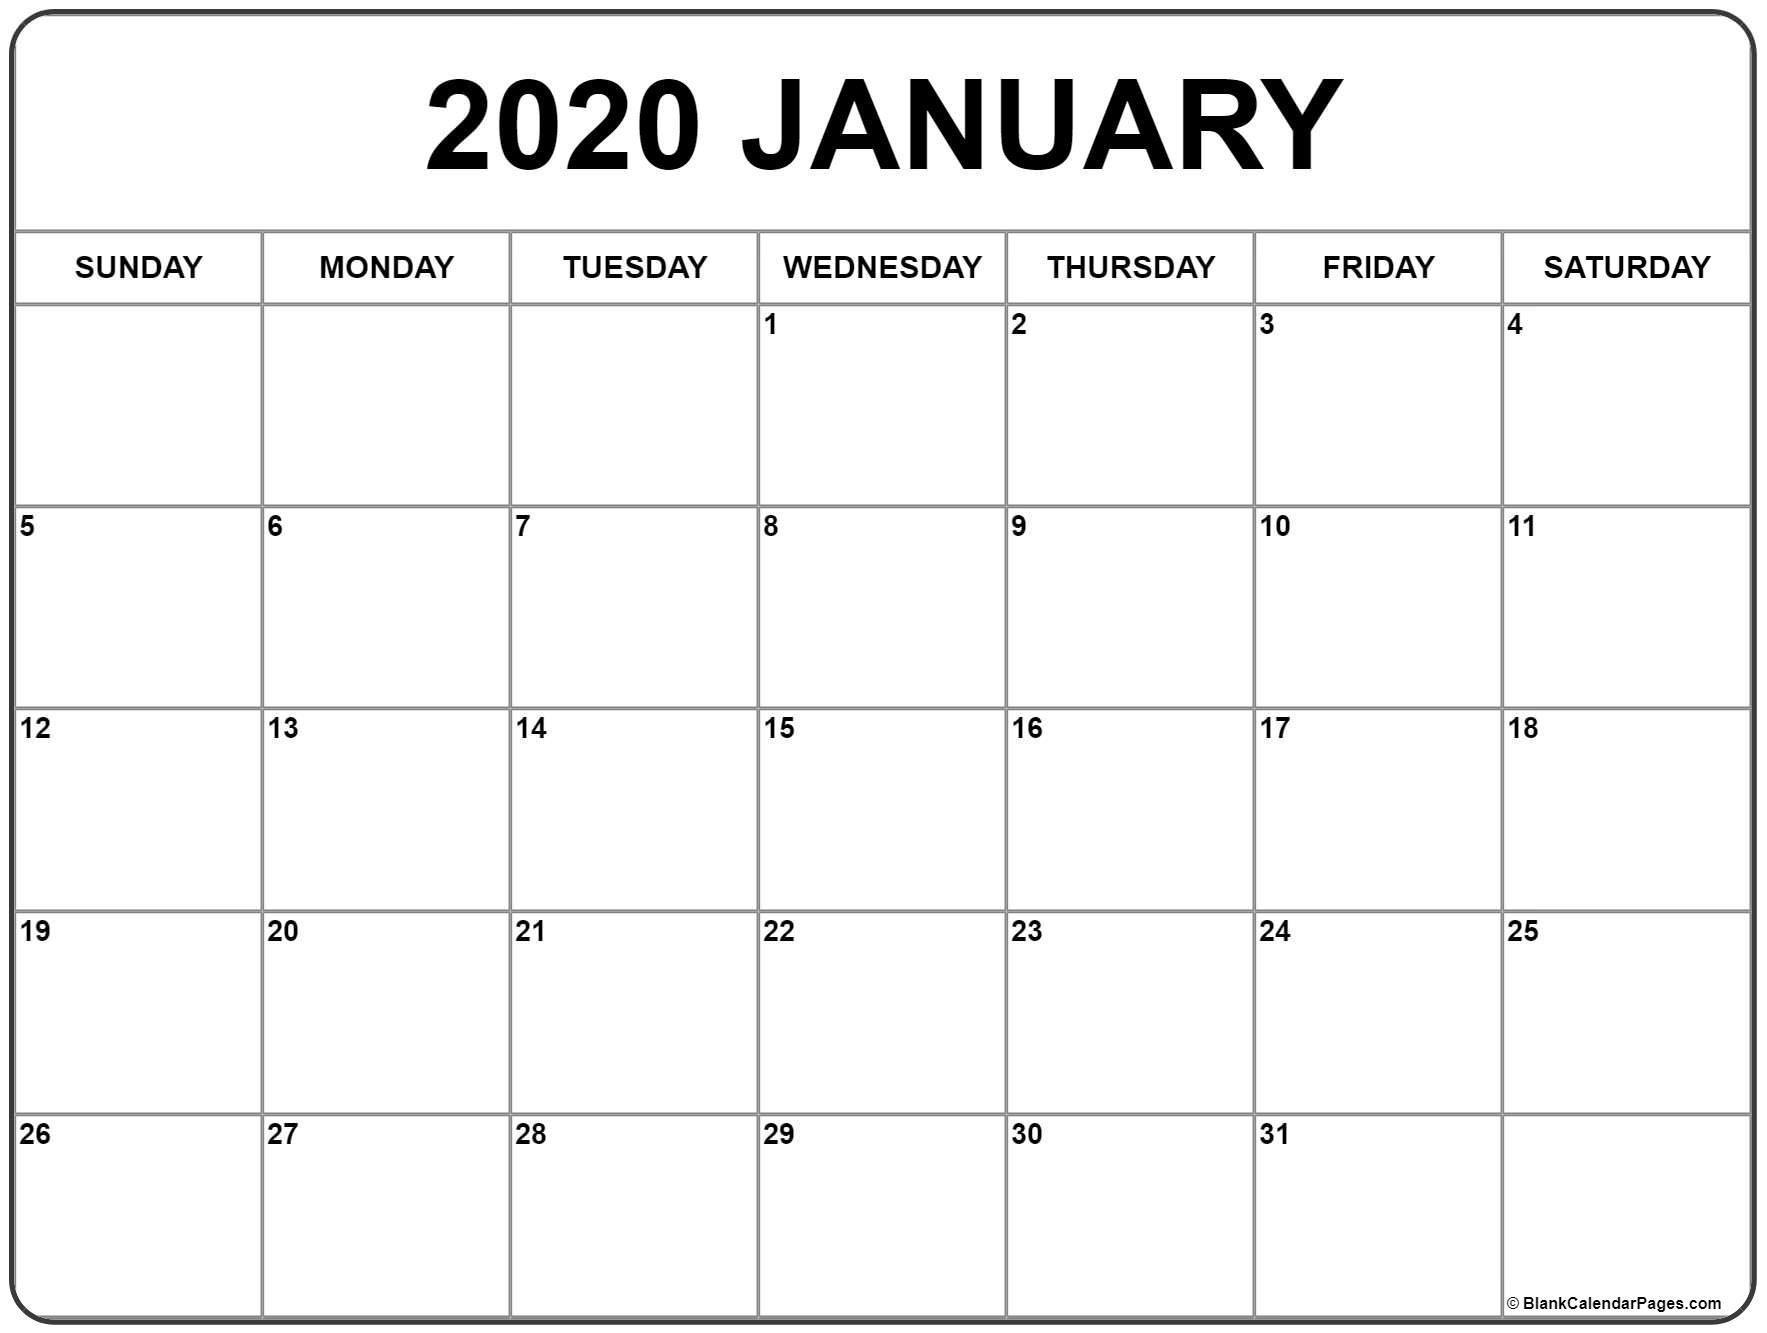 January 2020 Calendar | Free Printable Monthly Calendars for Free Printable Calendars 2020 Templates